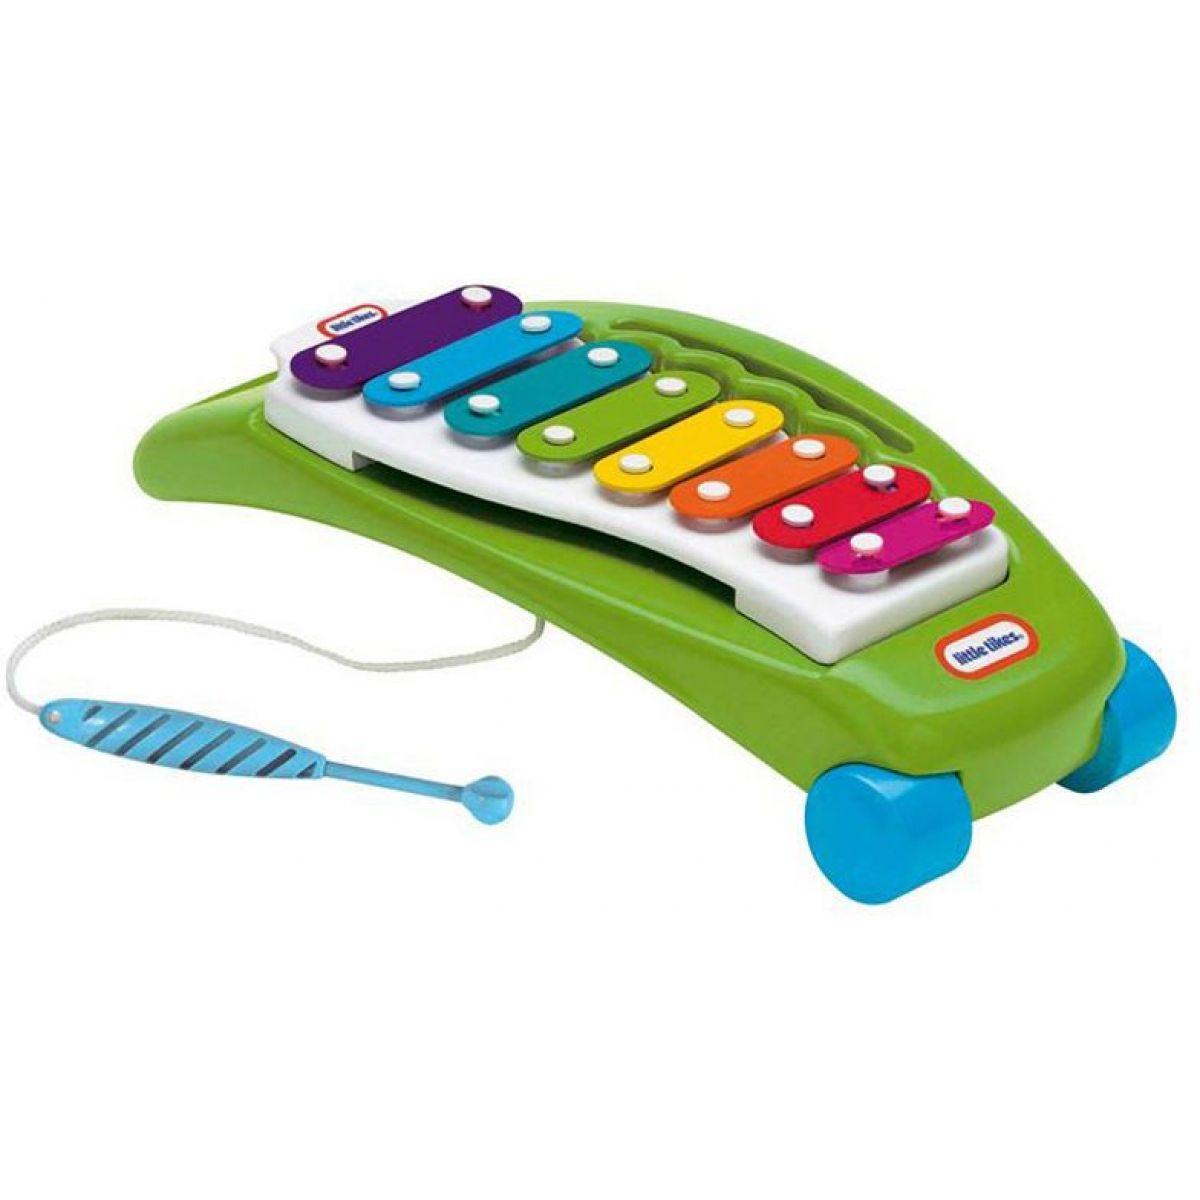 Little Tikes Tap a Tune Xylofon